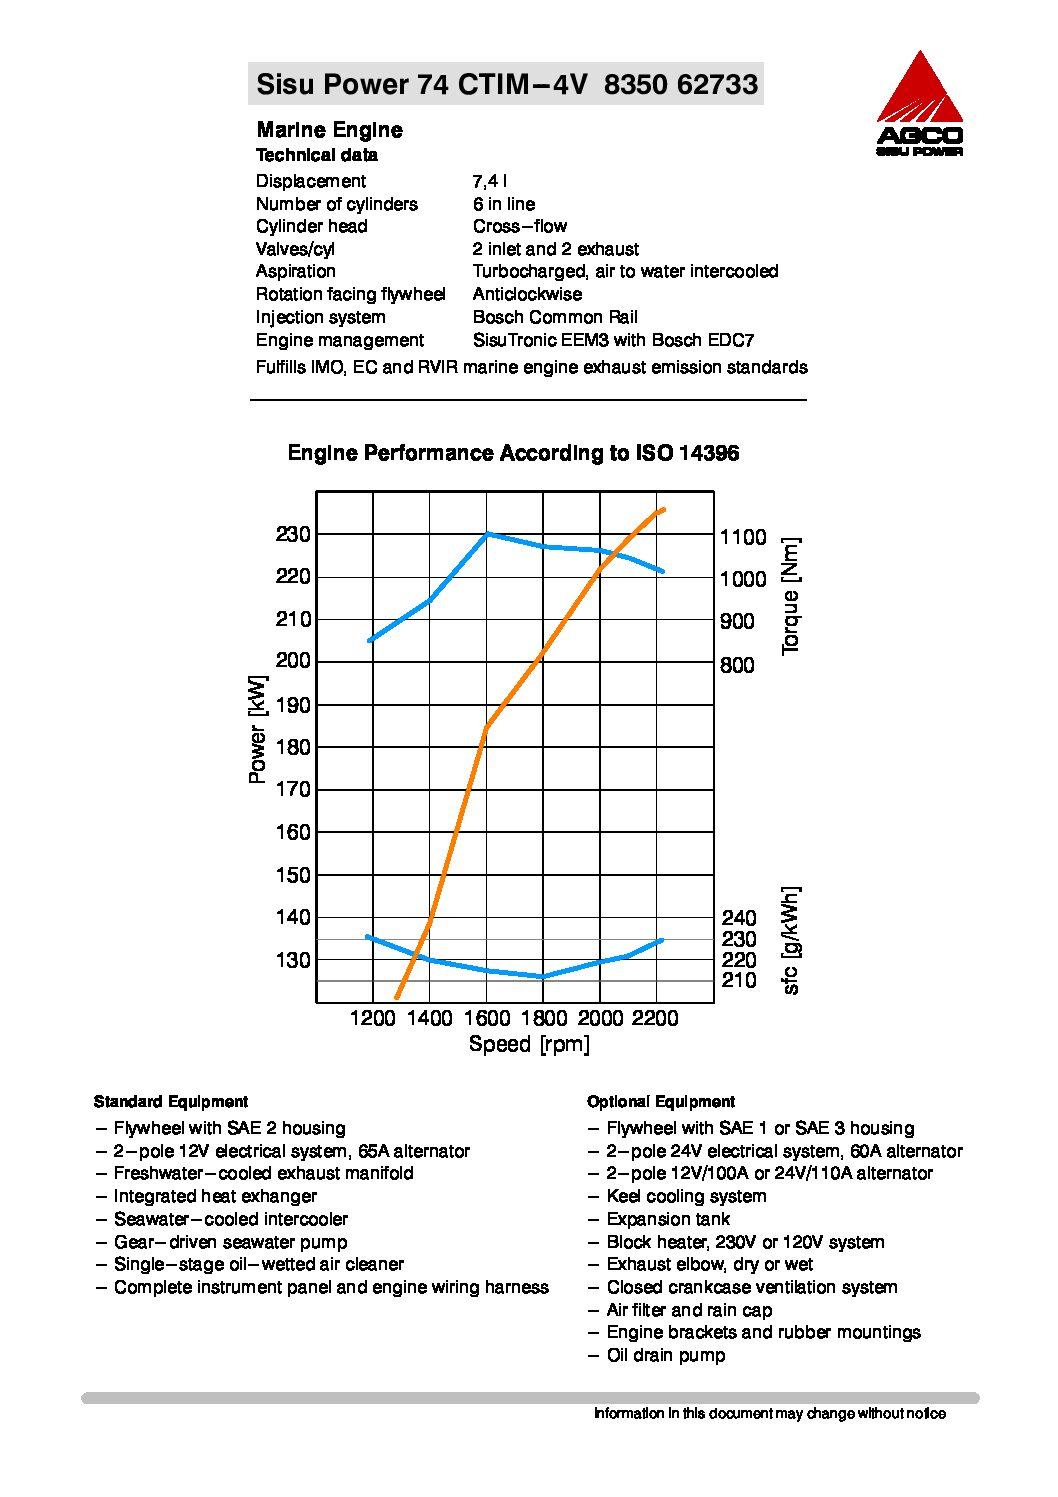 74 CTIM - data sheet